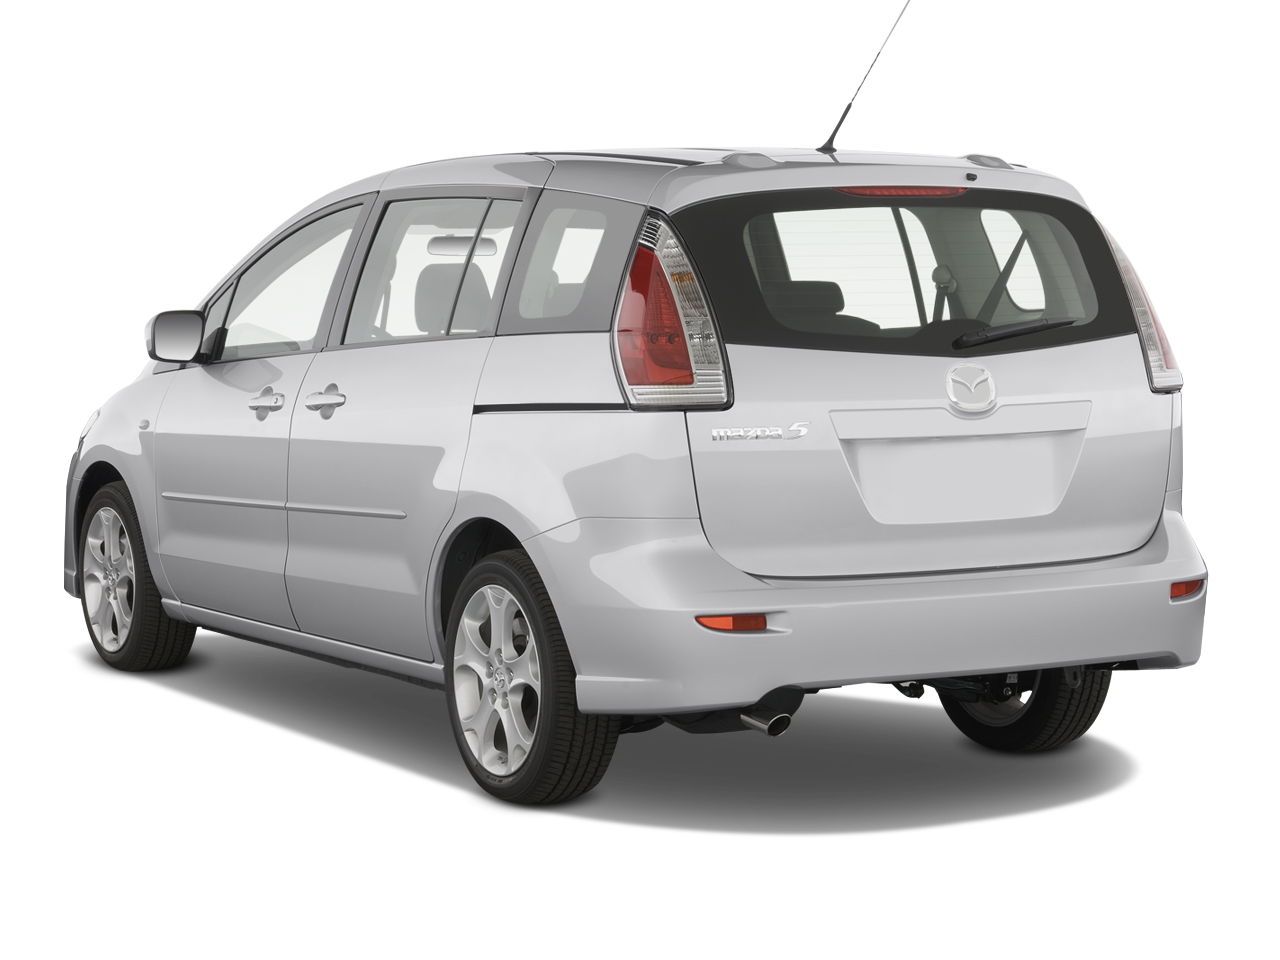 http://st.automobilemag.com/uploads/sites/10/2015/11/2008-mazda-mazda5-sport-wagon-angular-rear.png